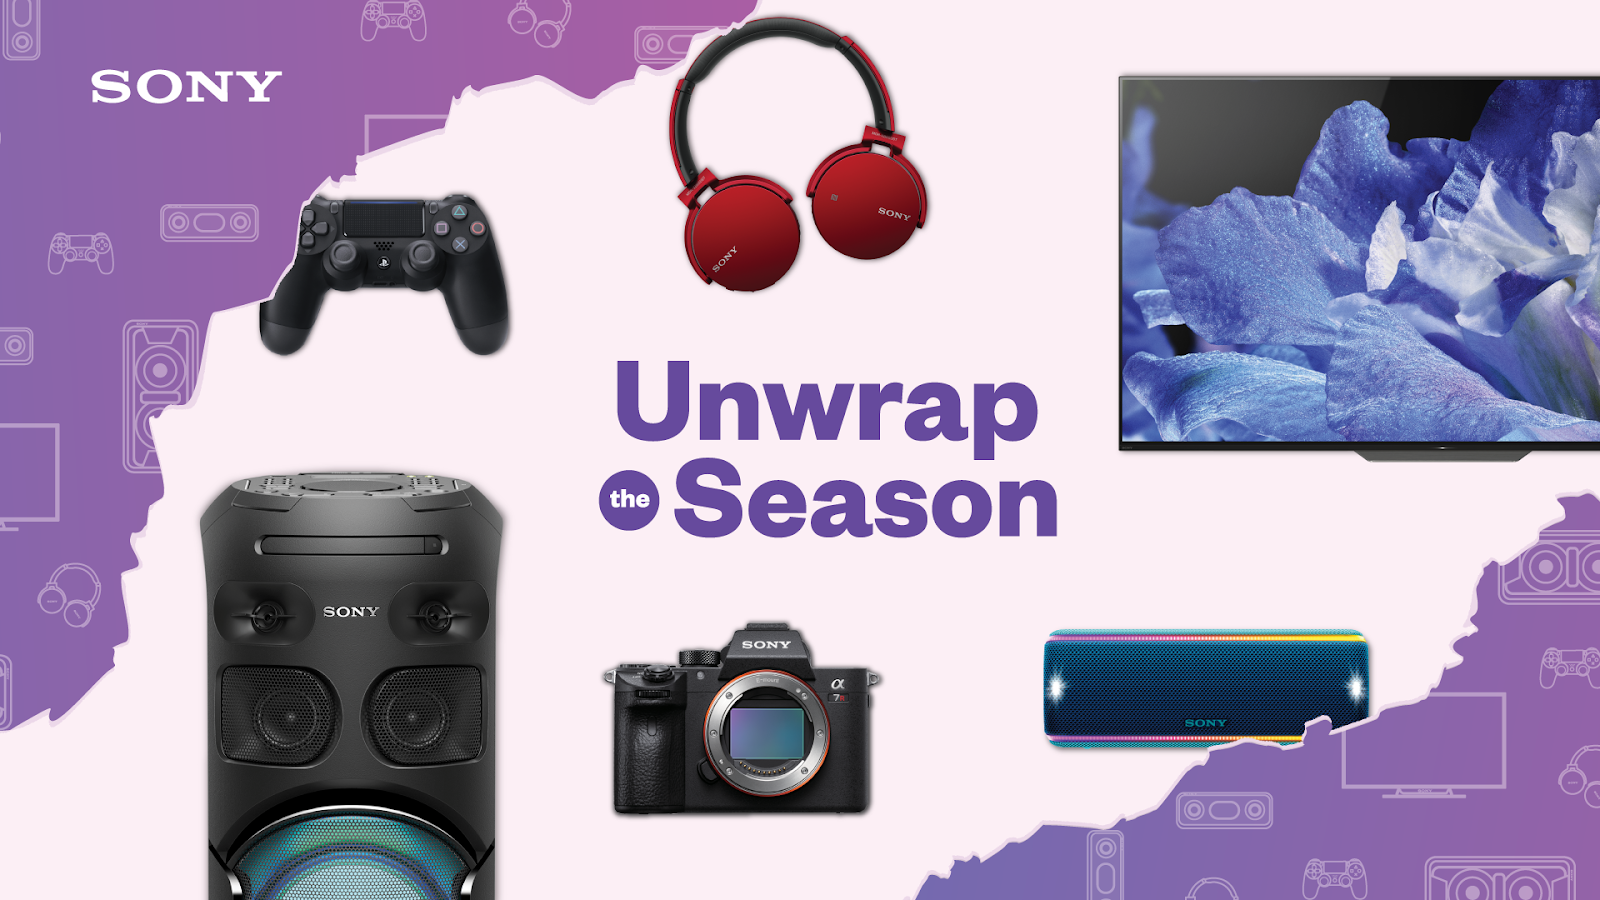 Sony Philippines Unwrap the Season Christmas Promo |Geekschicksten